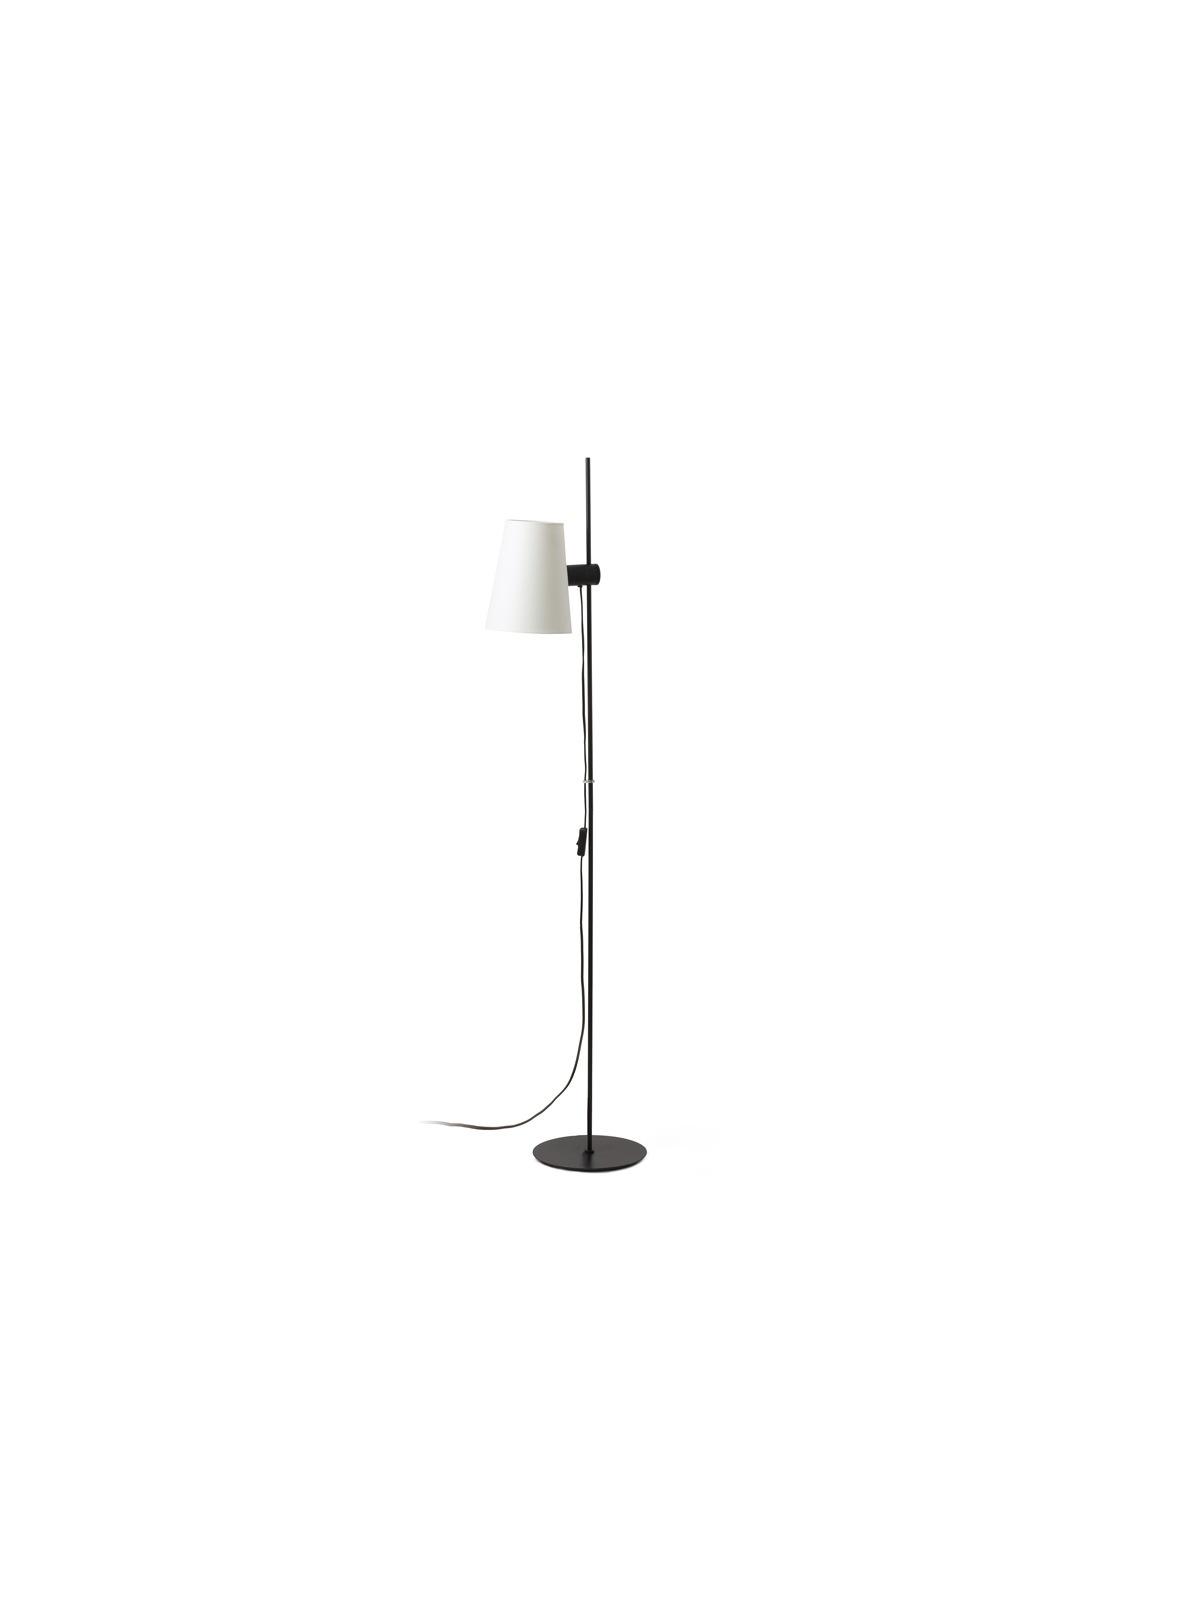 Faro Barcelona Lupe Stehlampe Designort